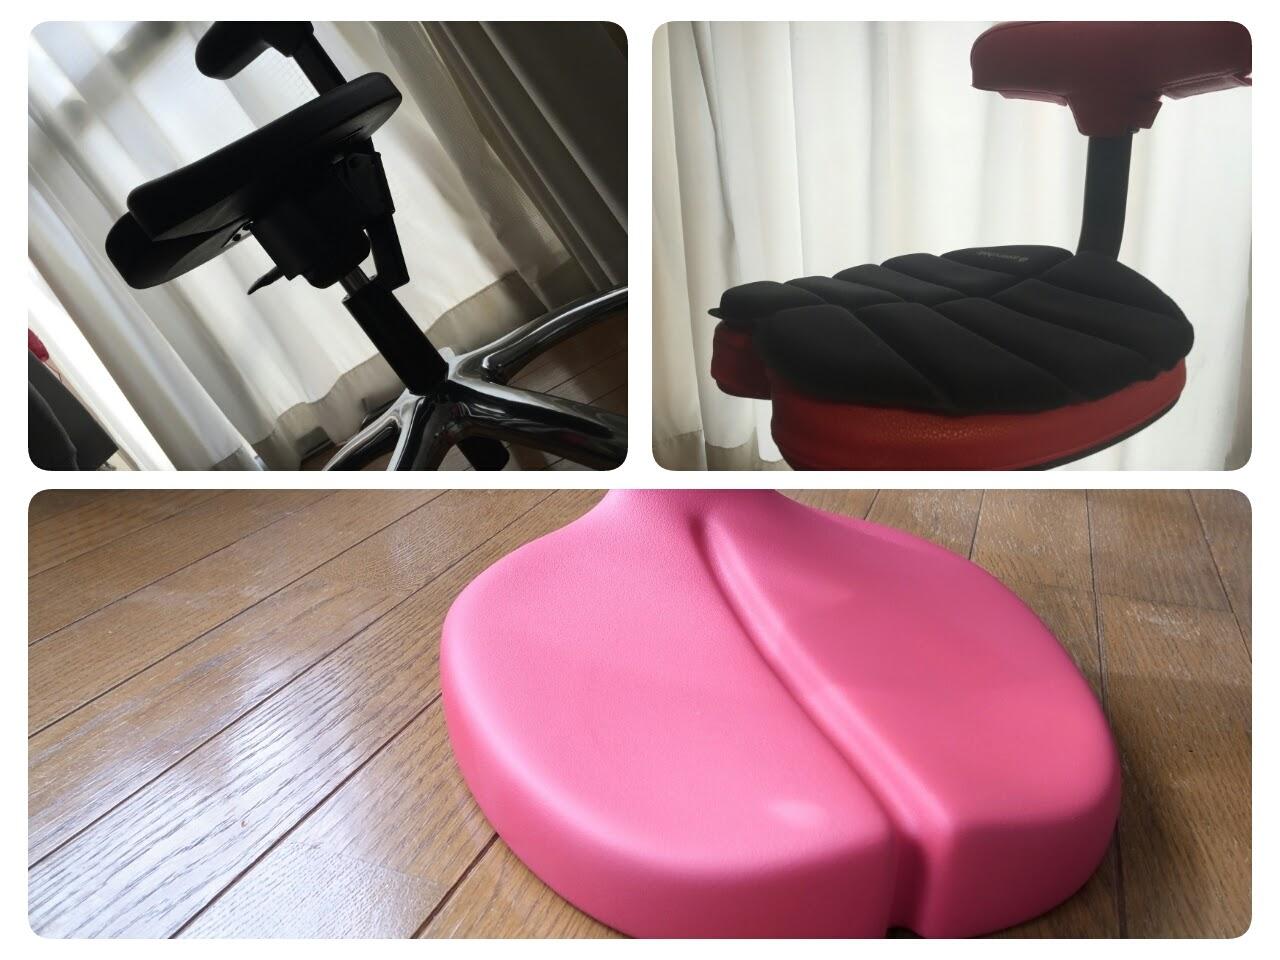 1072-201511_ayur chair and medical sheet